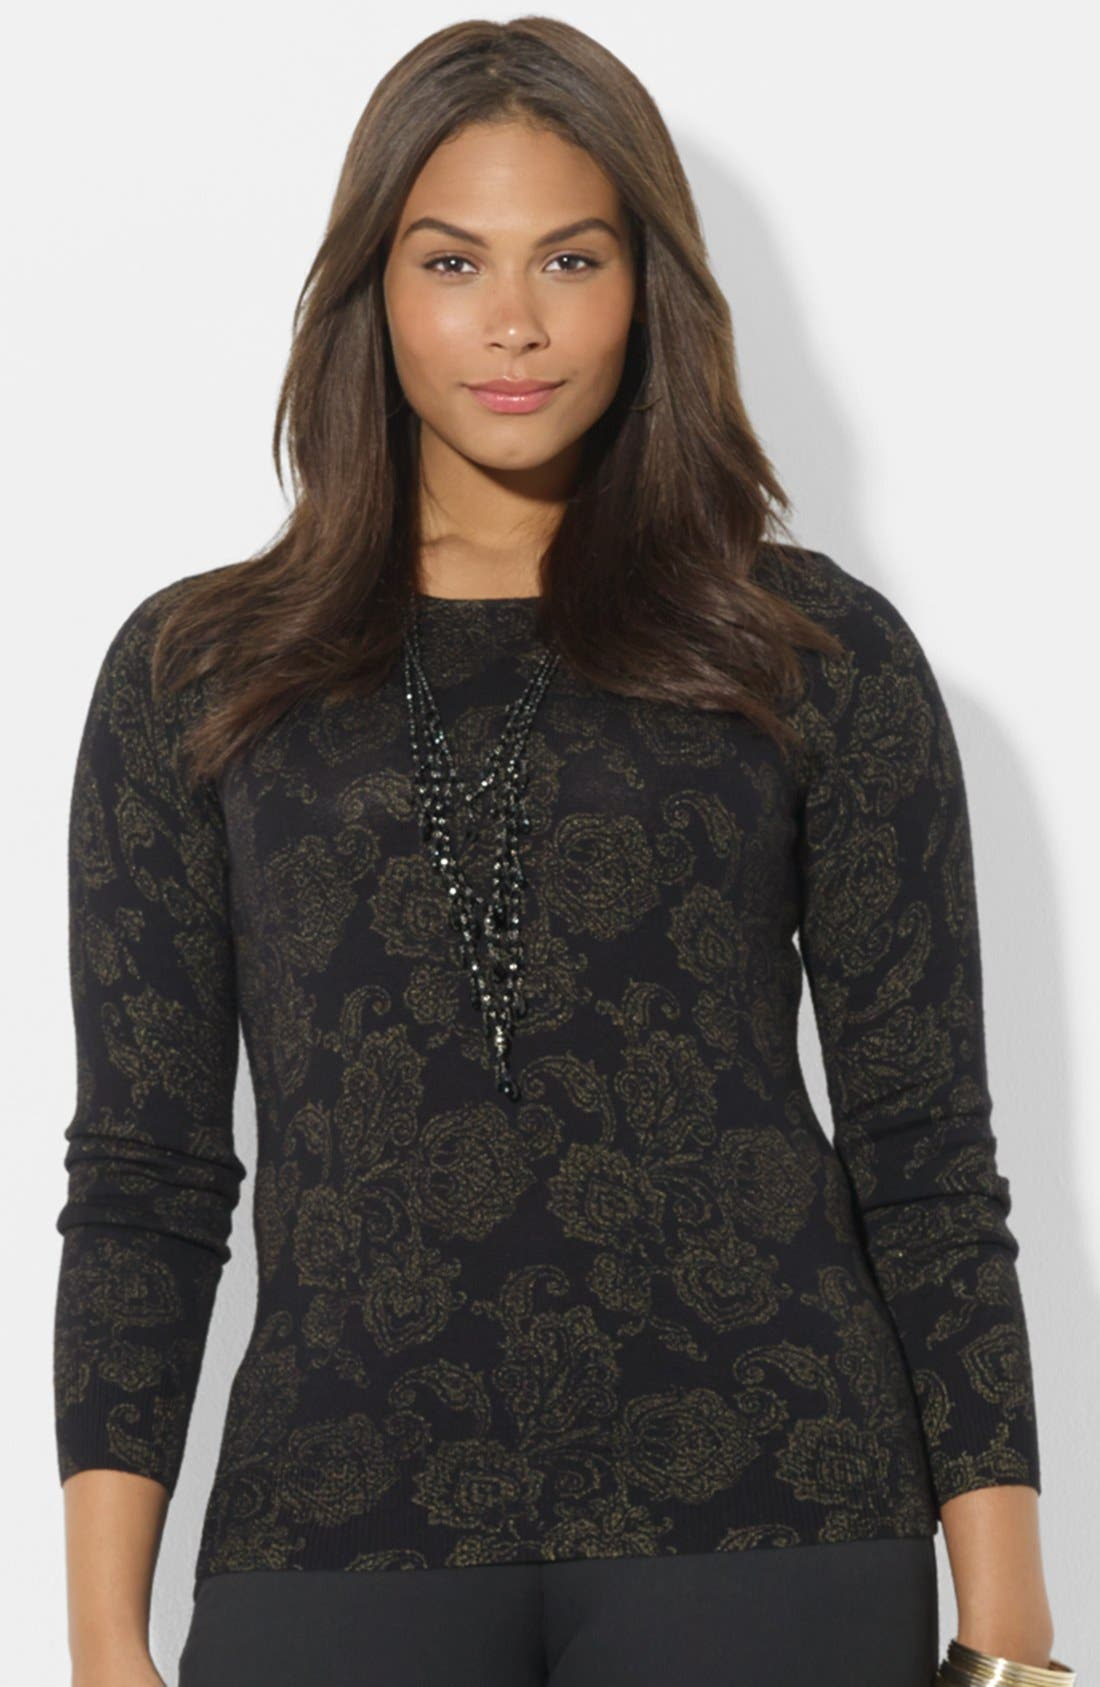 Alternate Image 1 Selected - Lauren Ralph Lauren Print Wool Sweater (Plus Size)